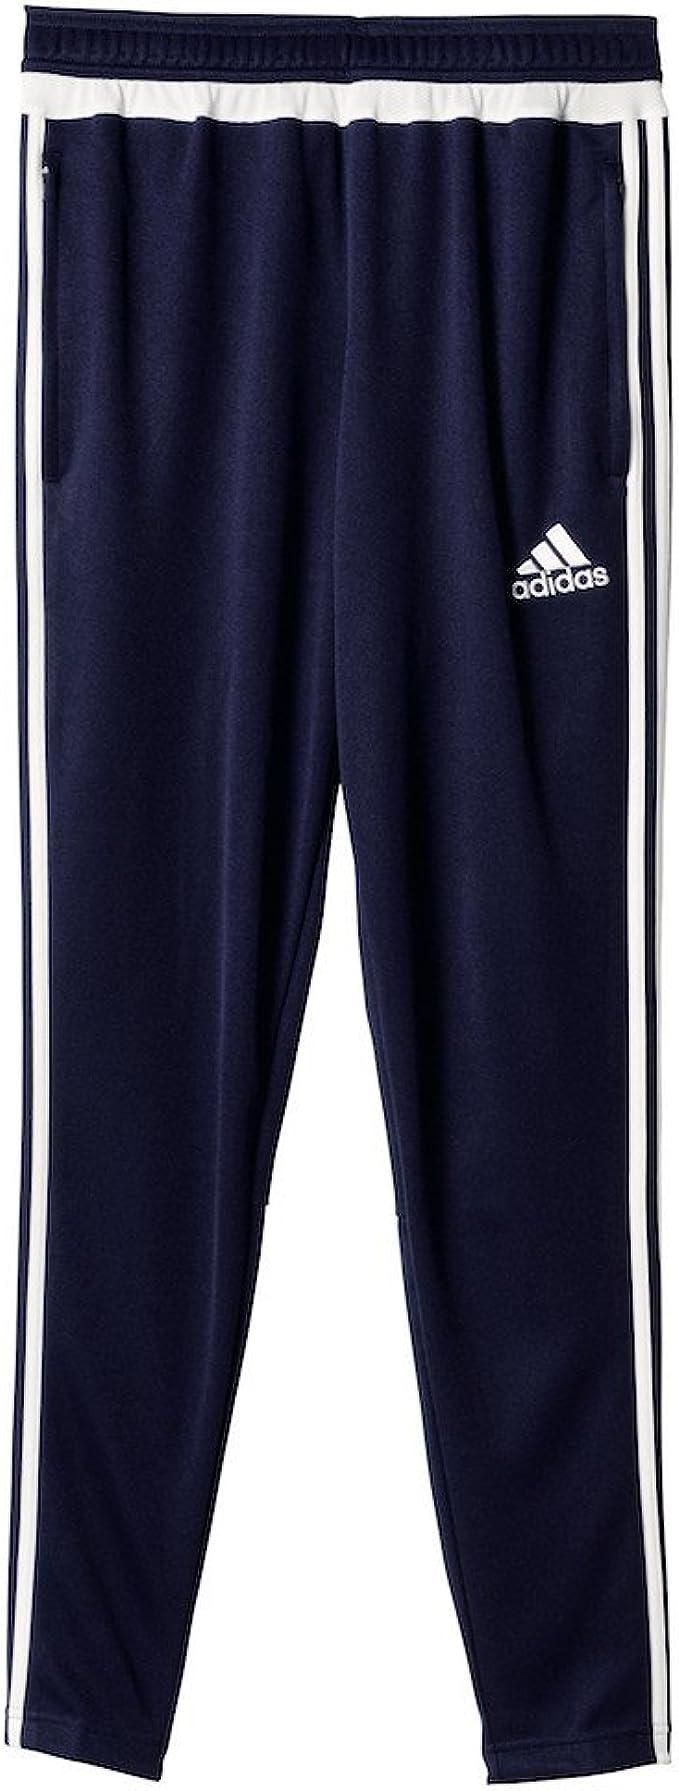 Adidas Tiro 15, pantalones de chándal para hombre, Azul (dark blue ...